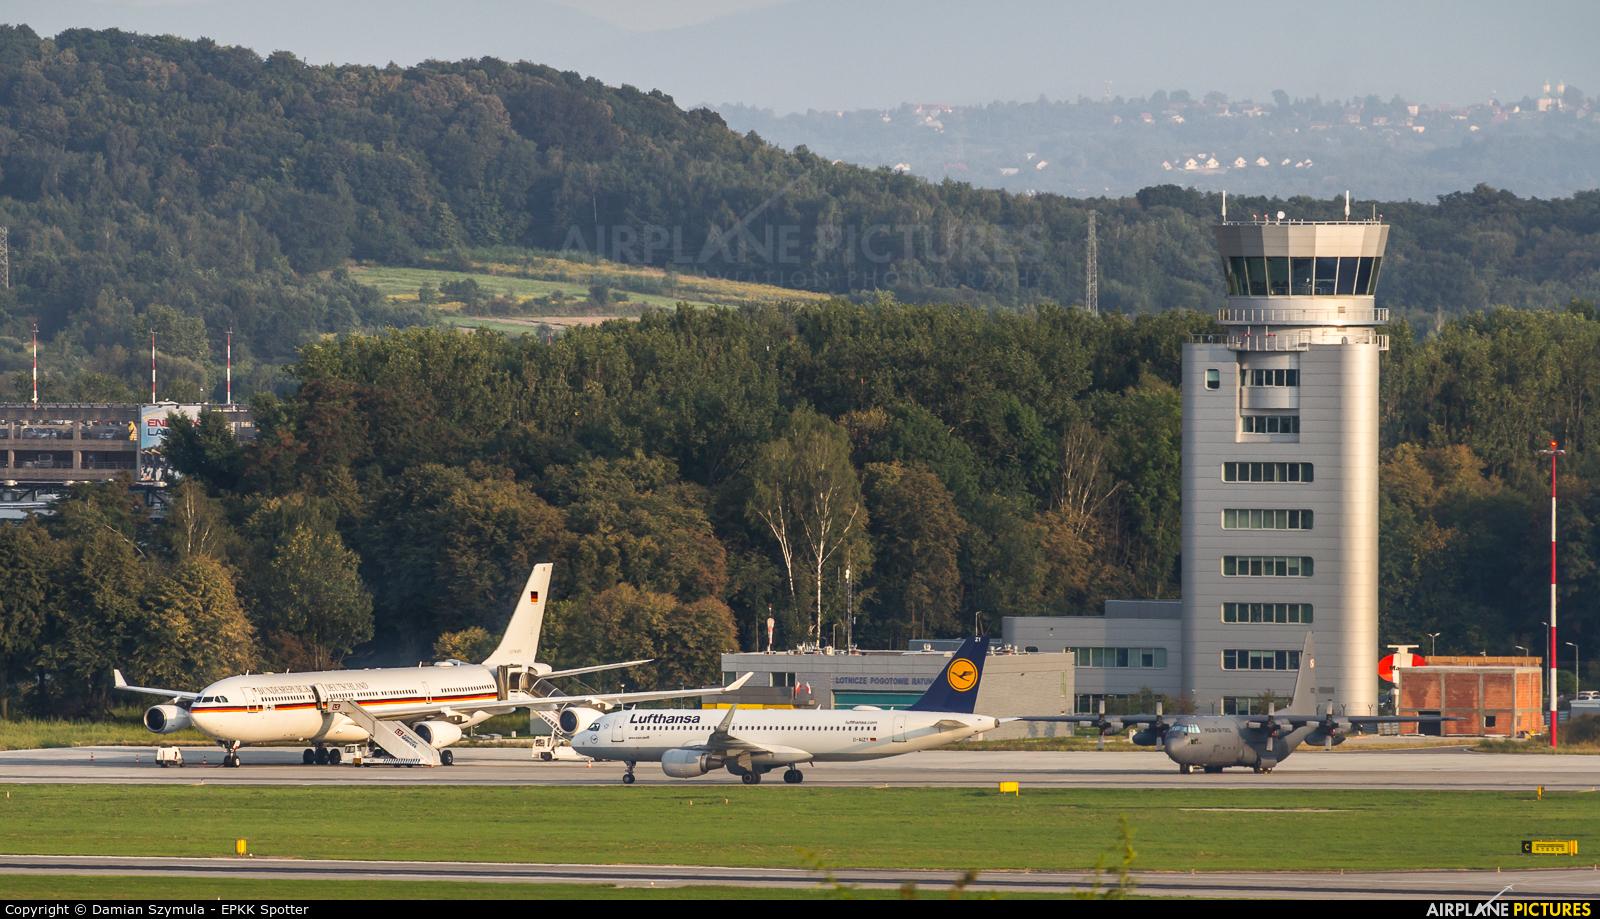 Lufthansa D-AIZY aircraft at Kraków - John Paul II Intl